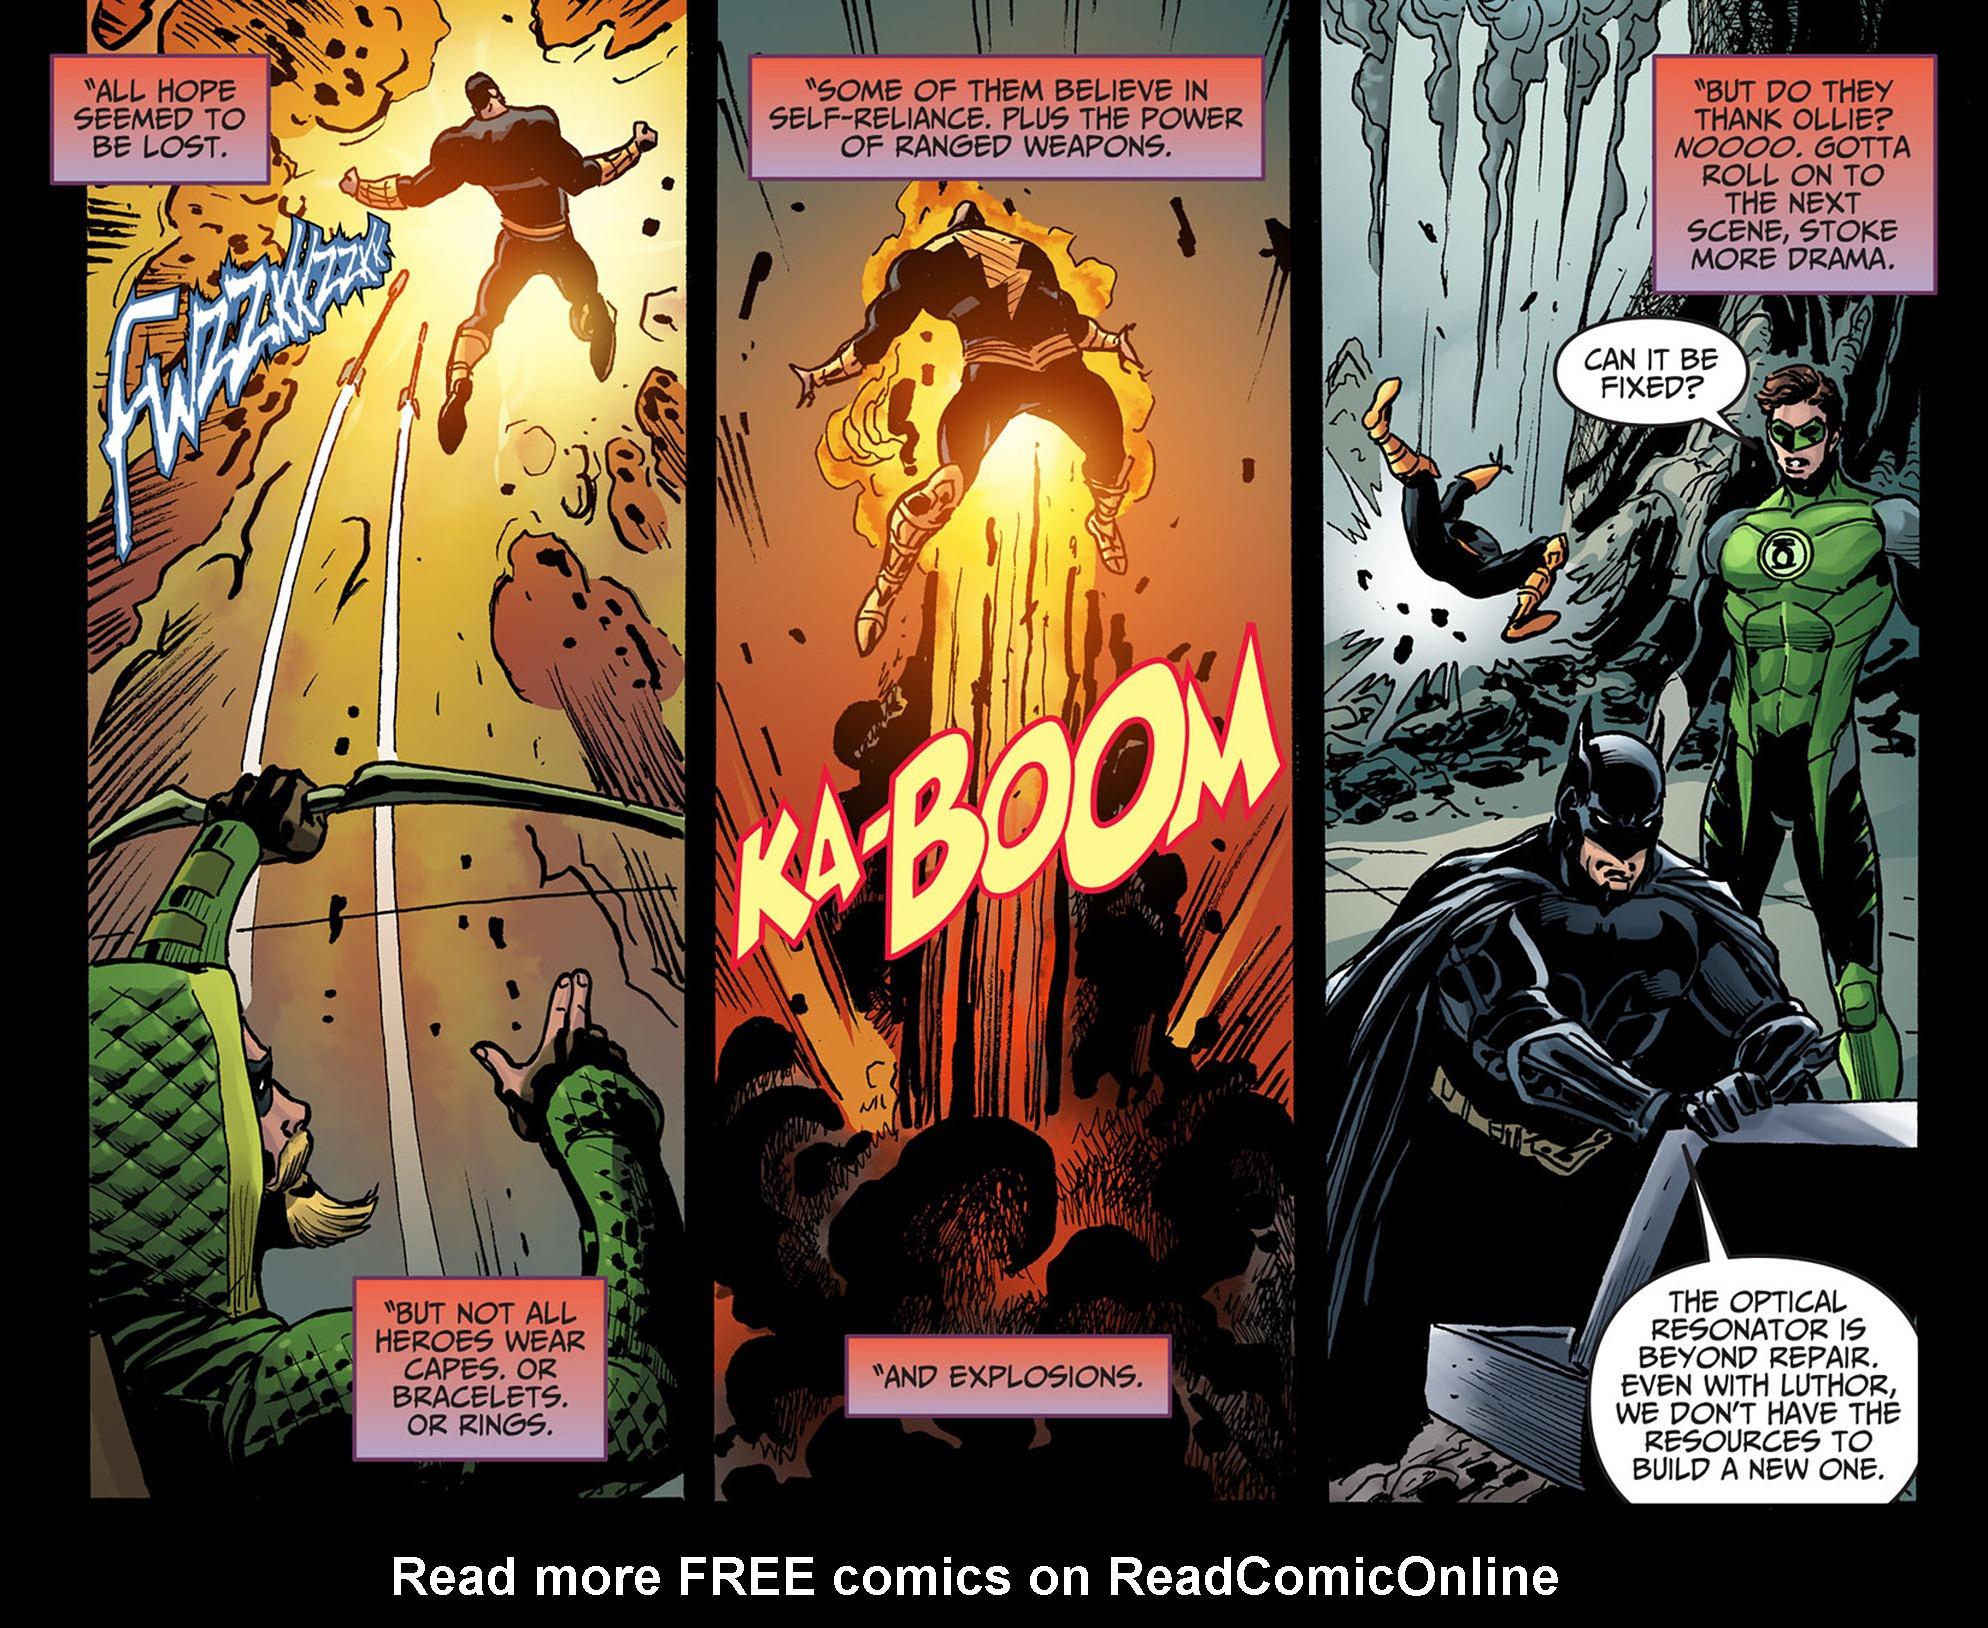 Read online Injustice: Ground Zero comic -  Issue #13 - 6